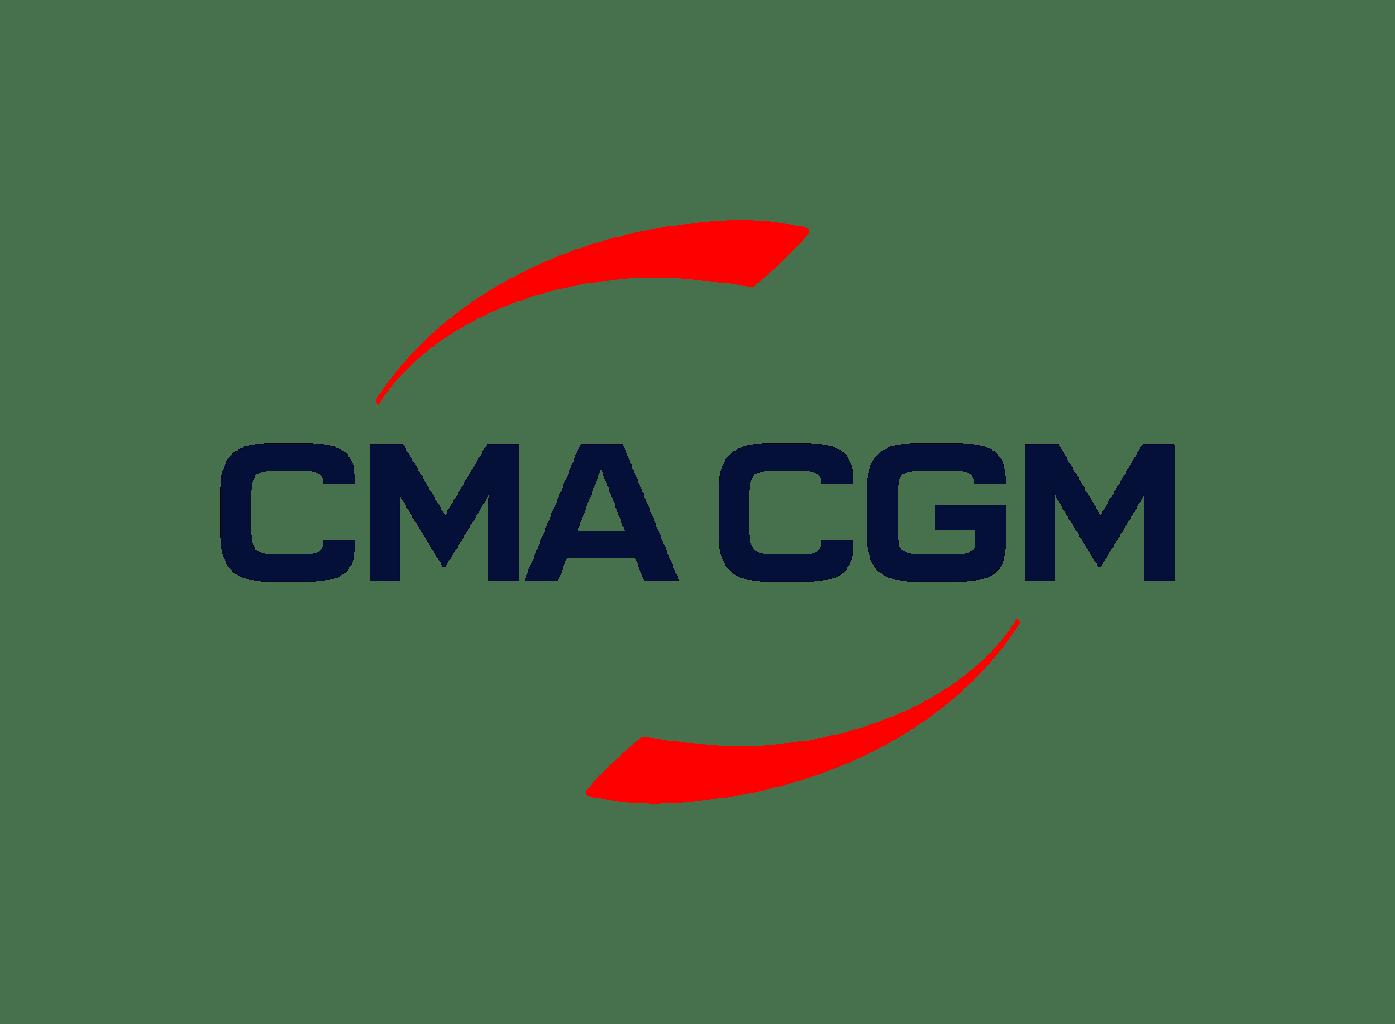 Partner Image CMA CGM